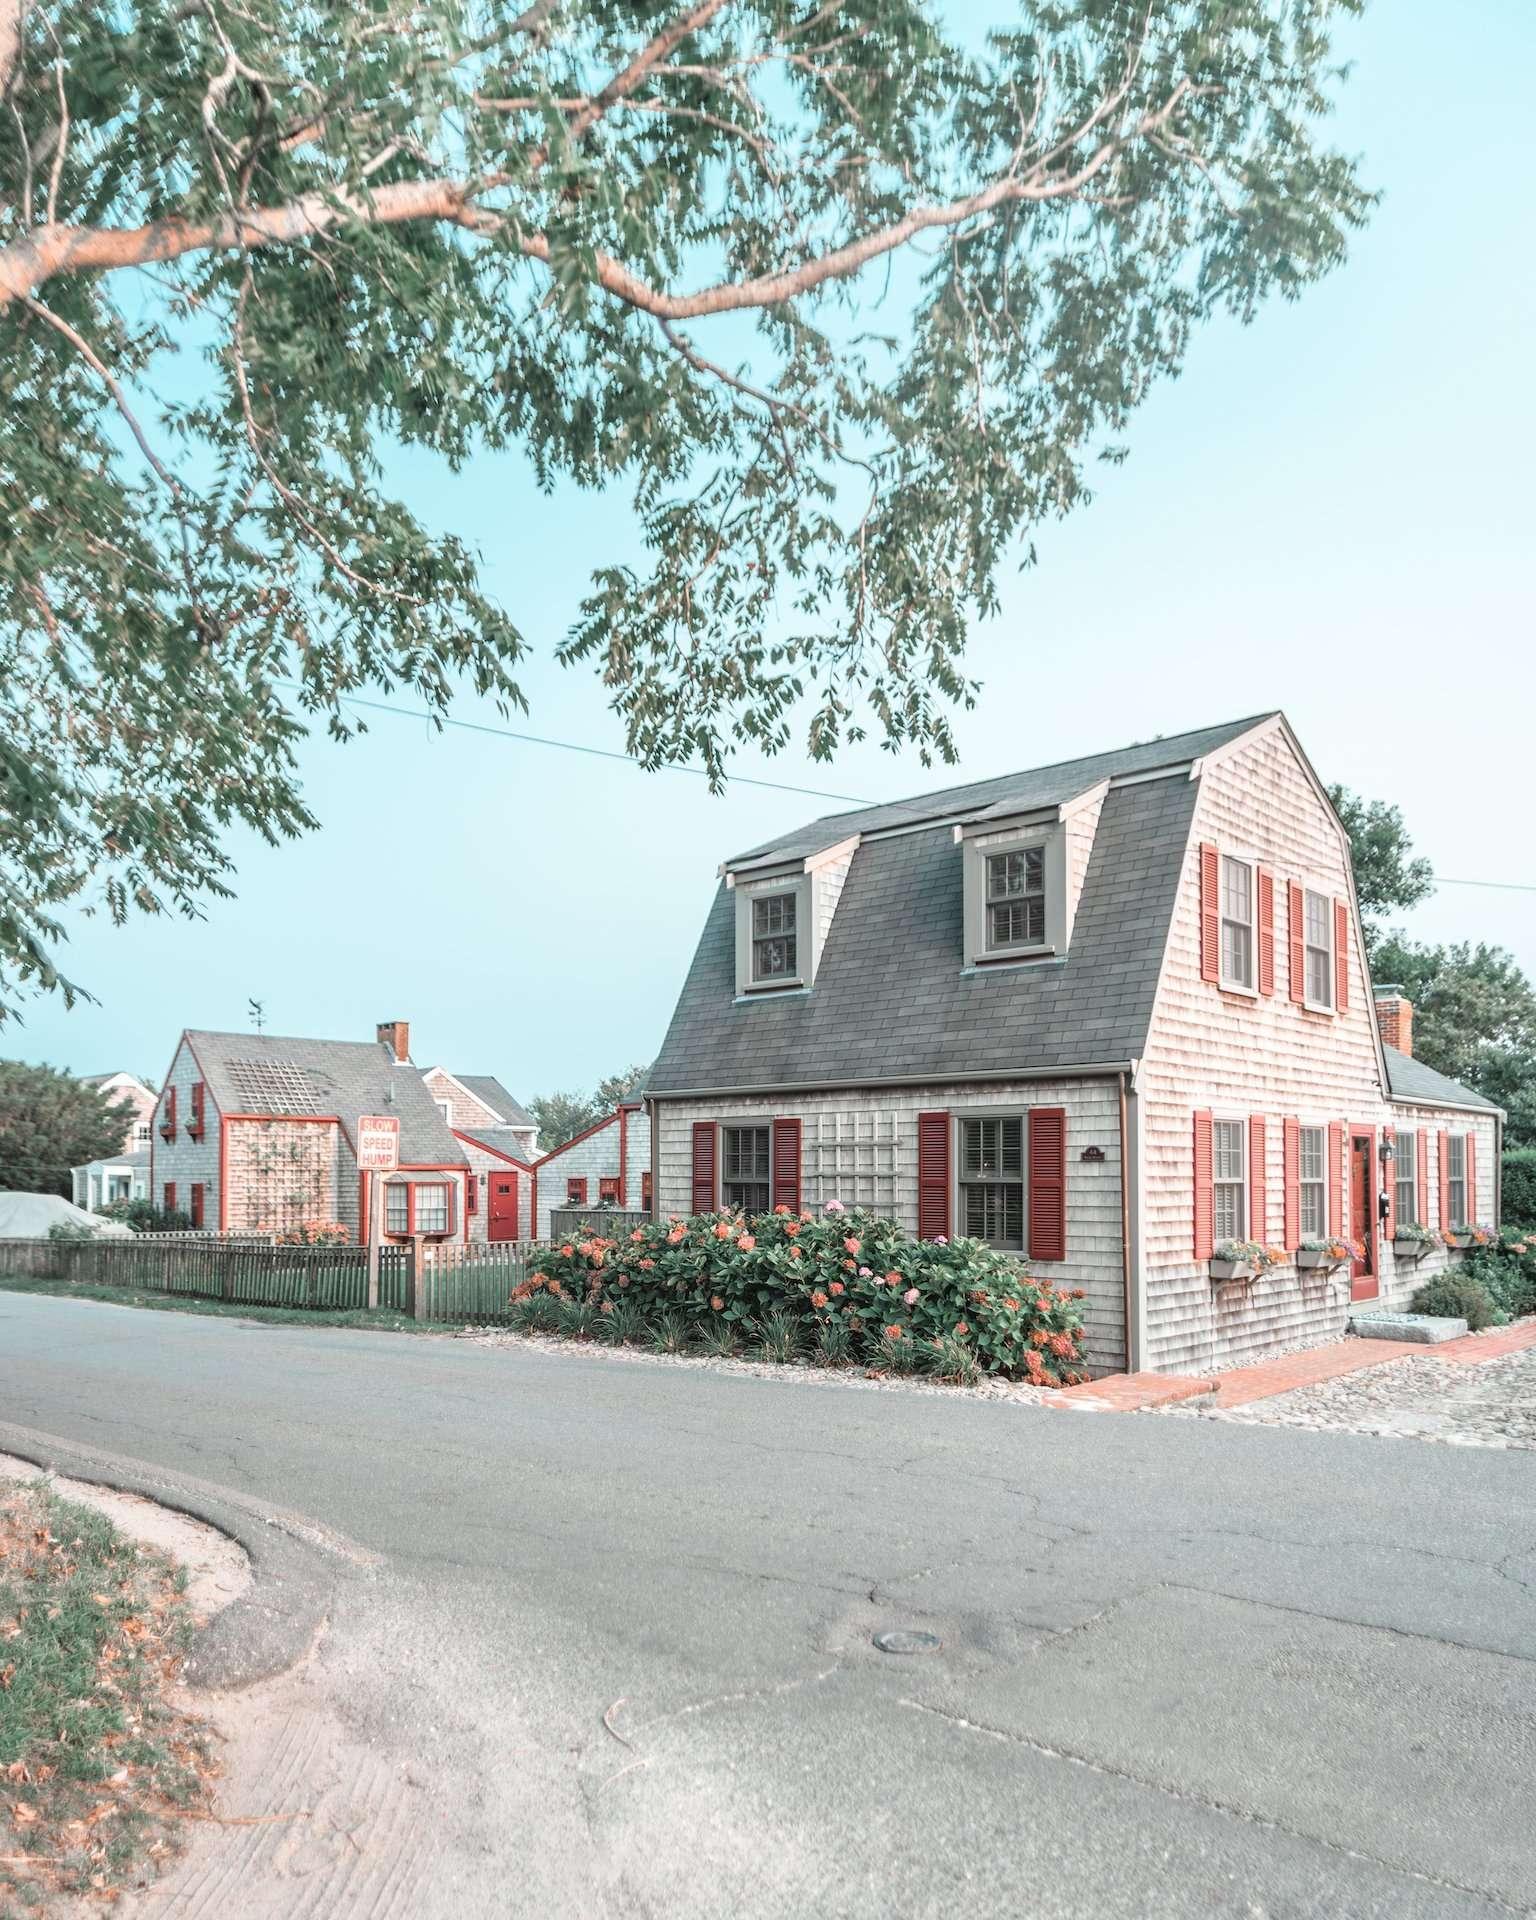 Charming Nantucket home